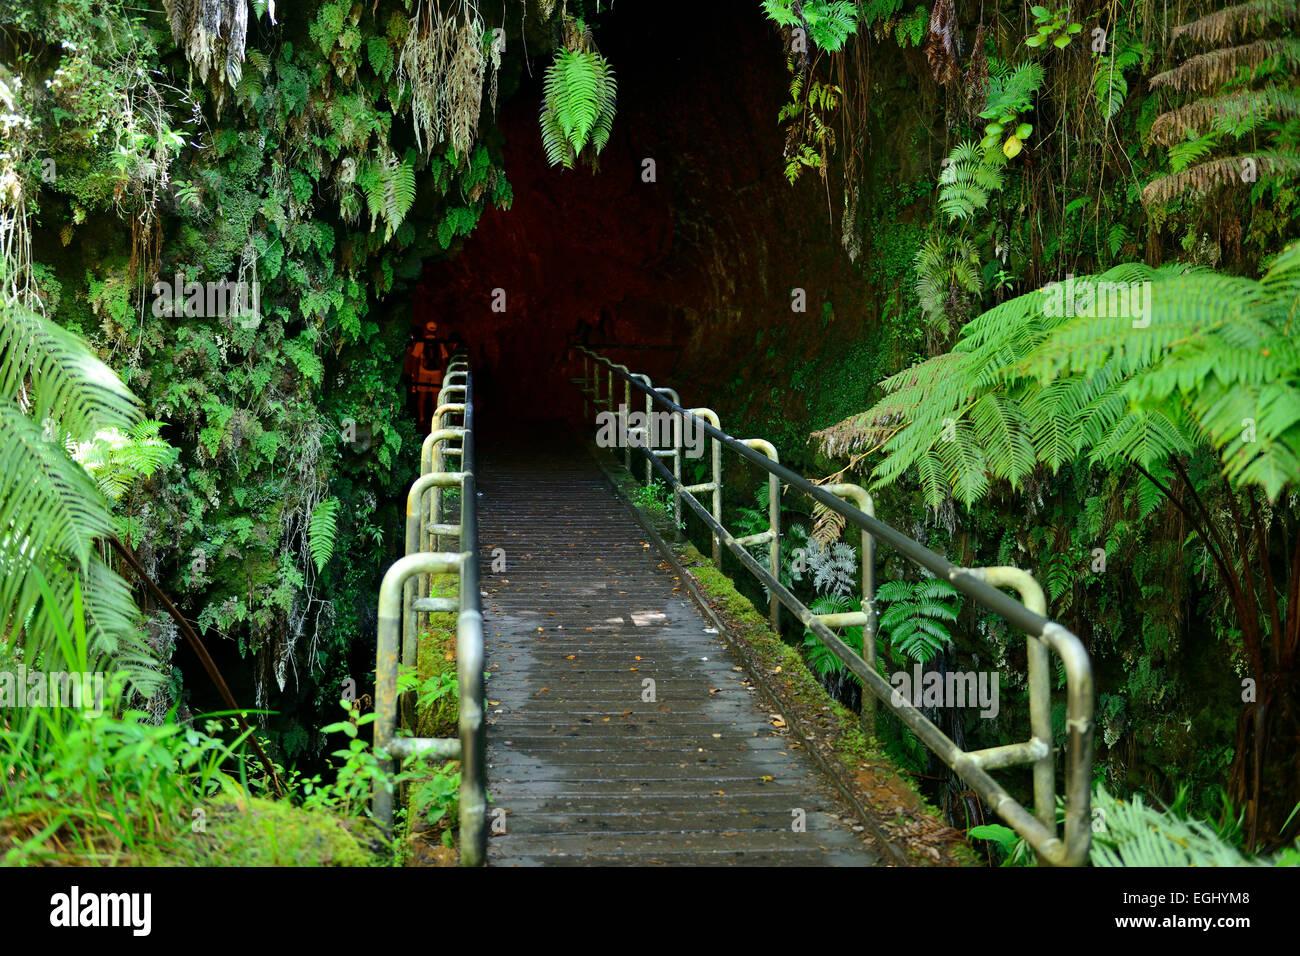 Entrance to Thurston lava tube in Volcanoes National Park on Big Island, Hawaii, USA Stock Photo